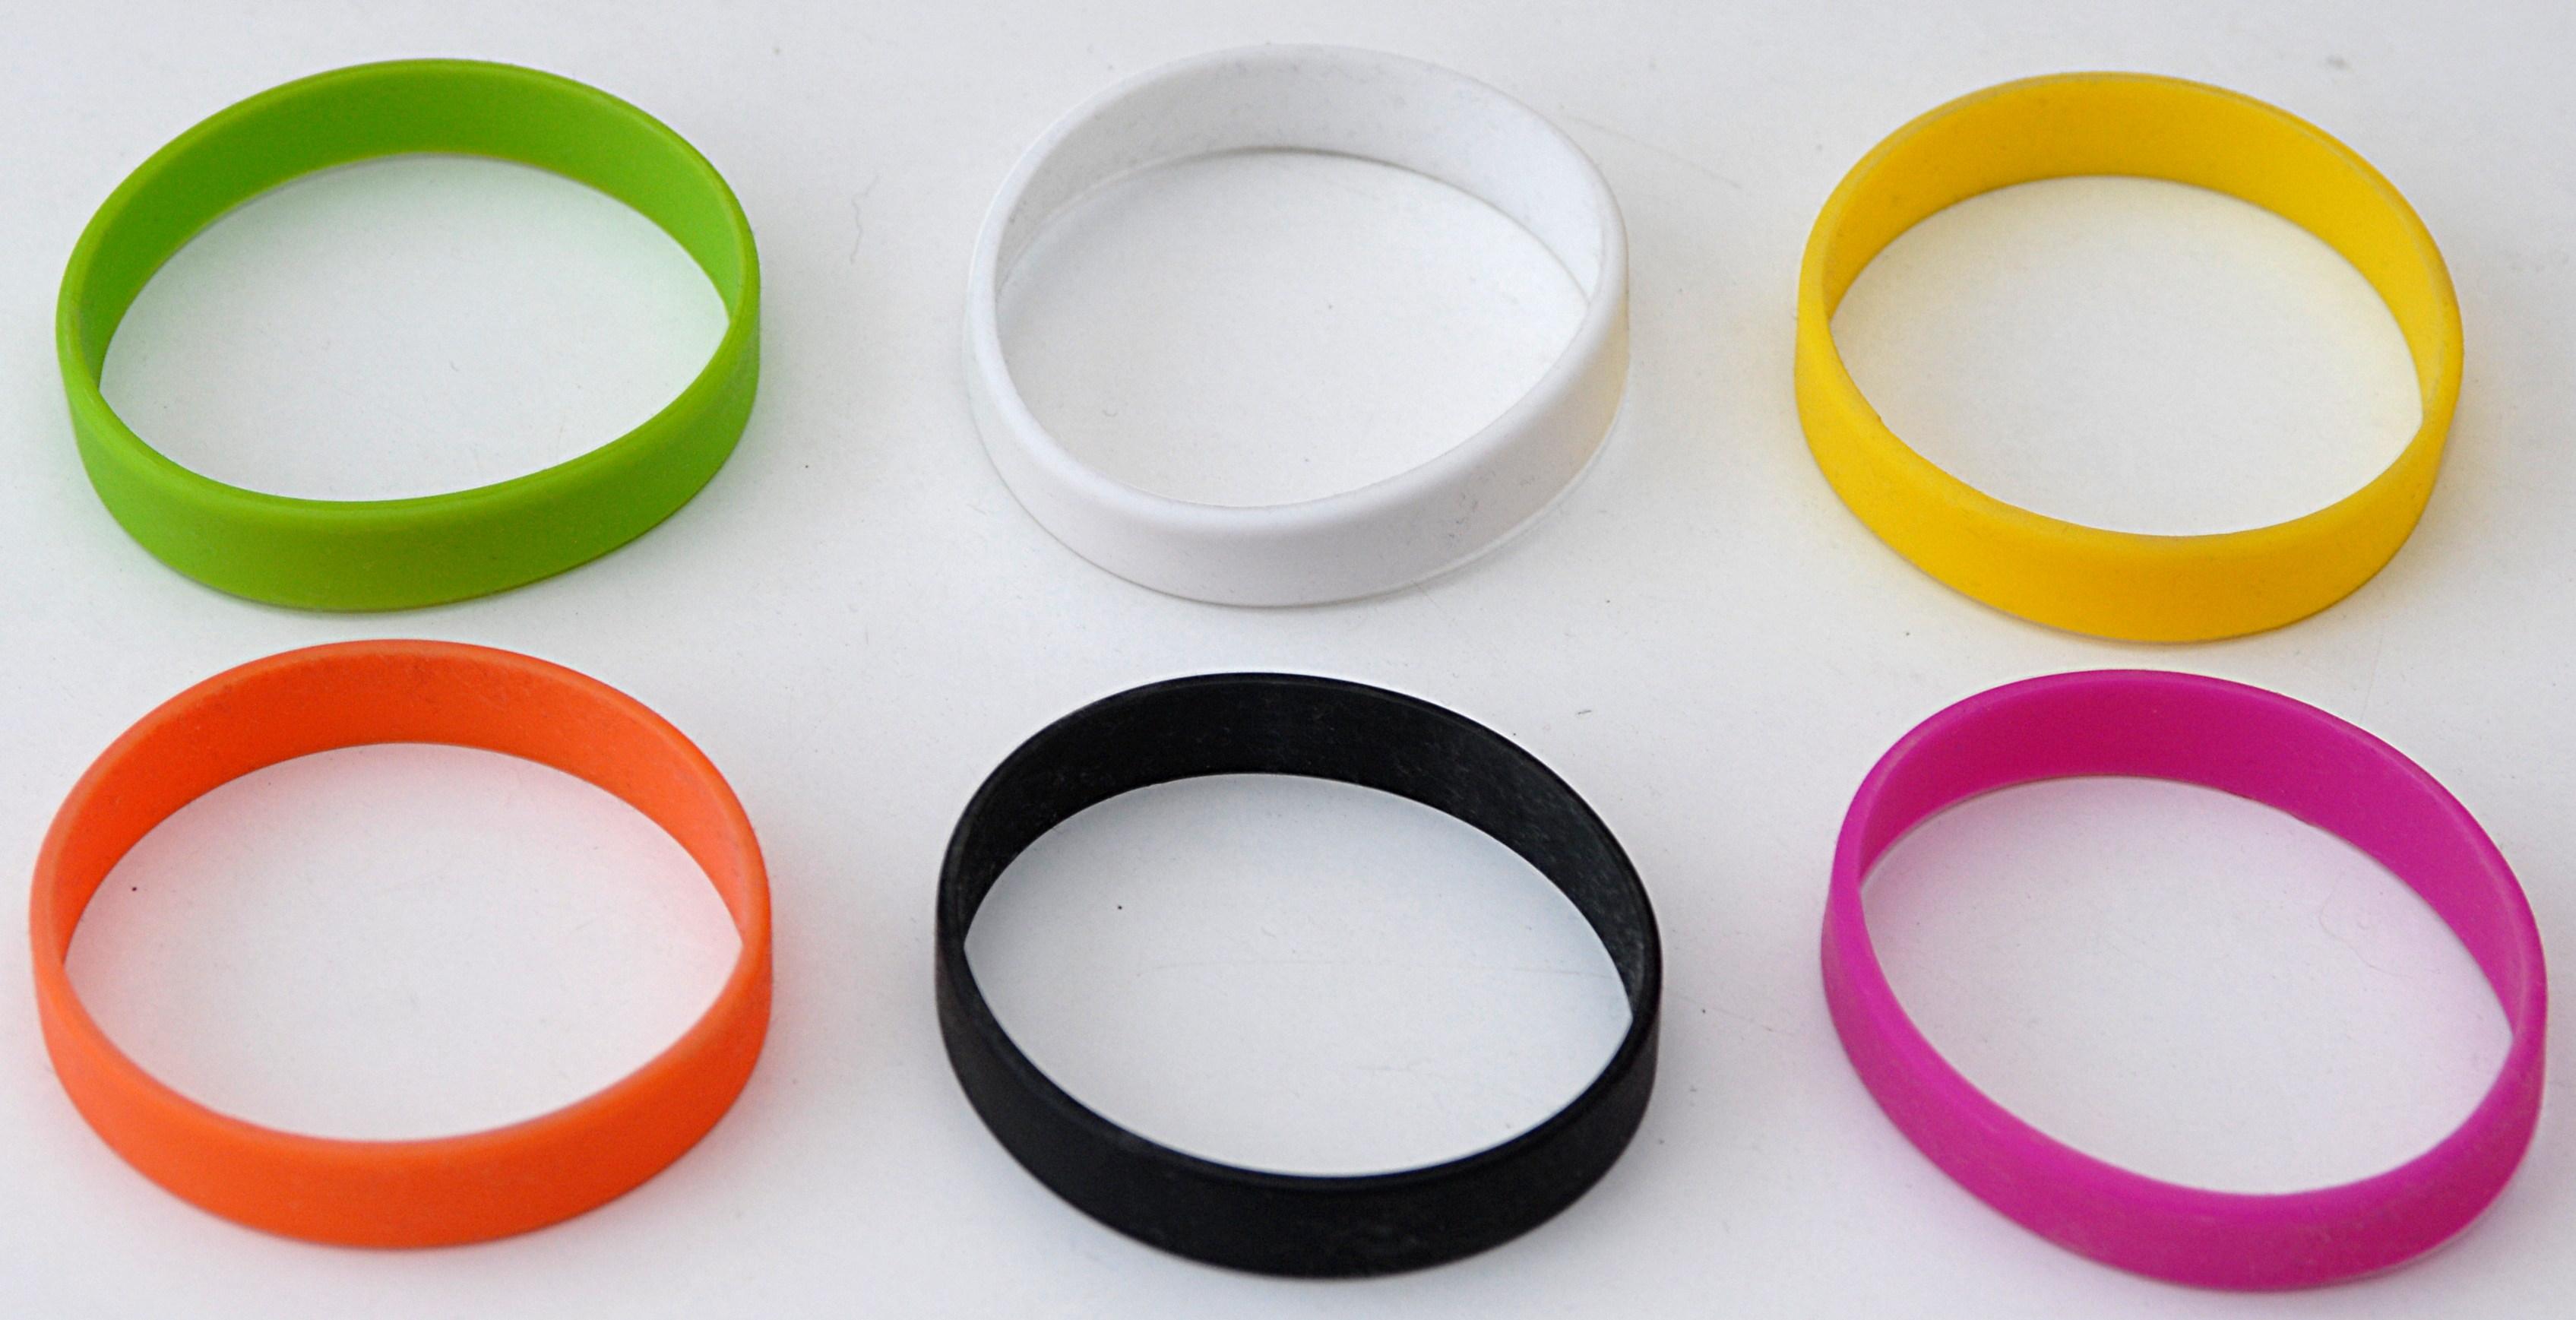 WOWA silicon strap, product photo